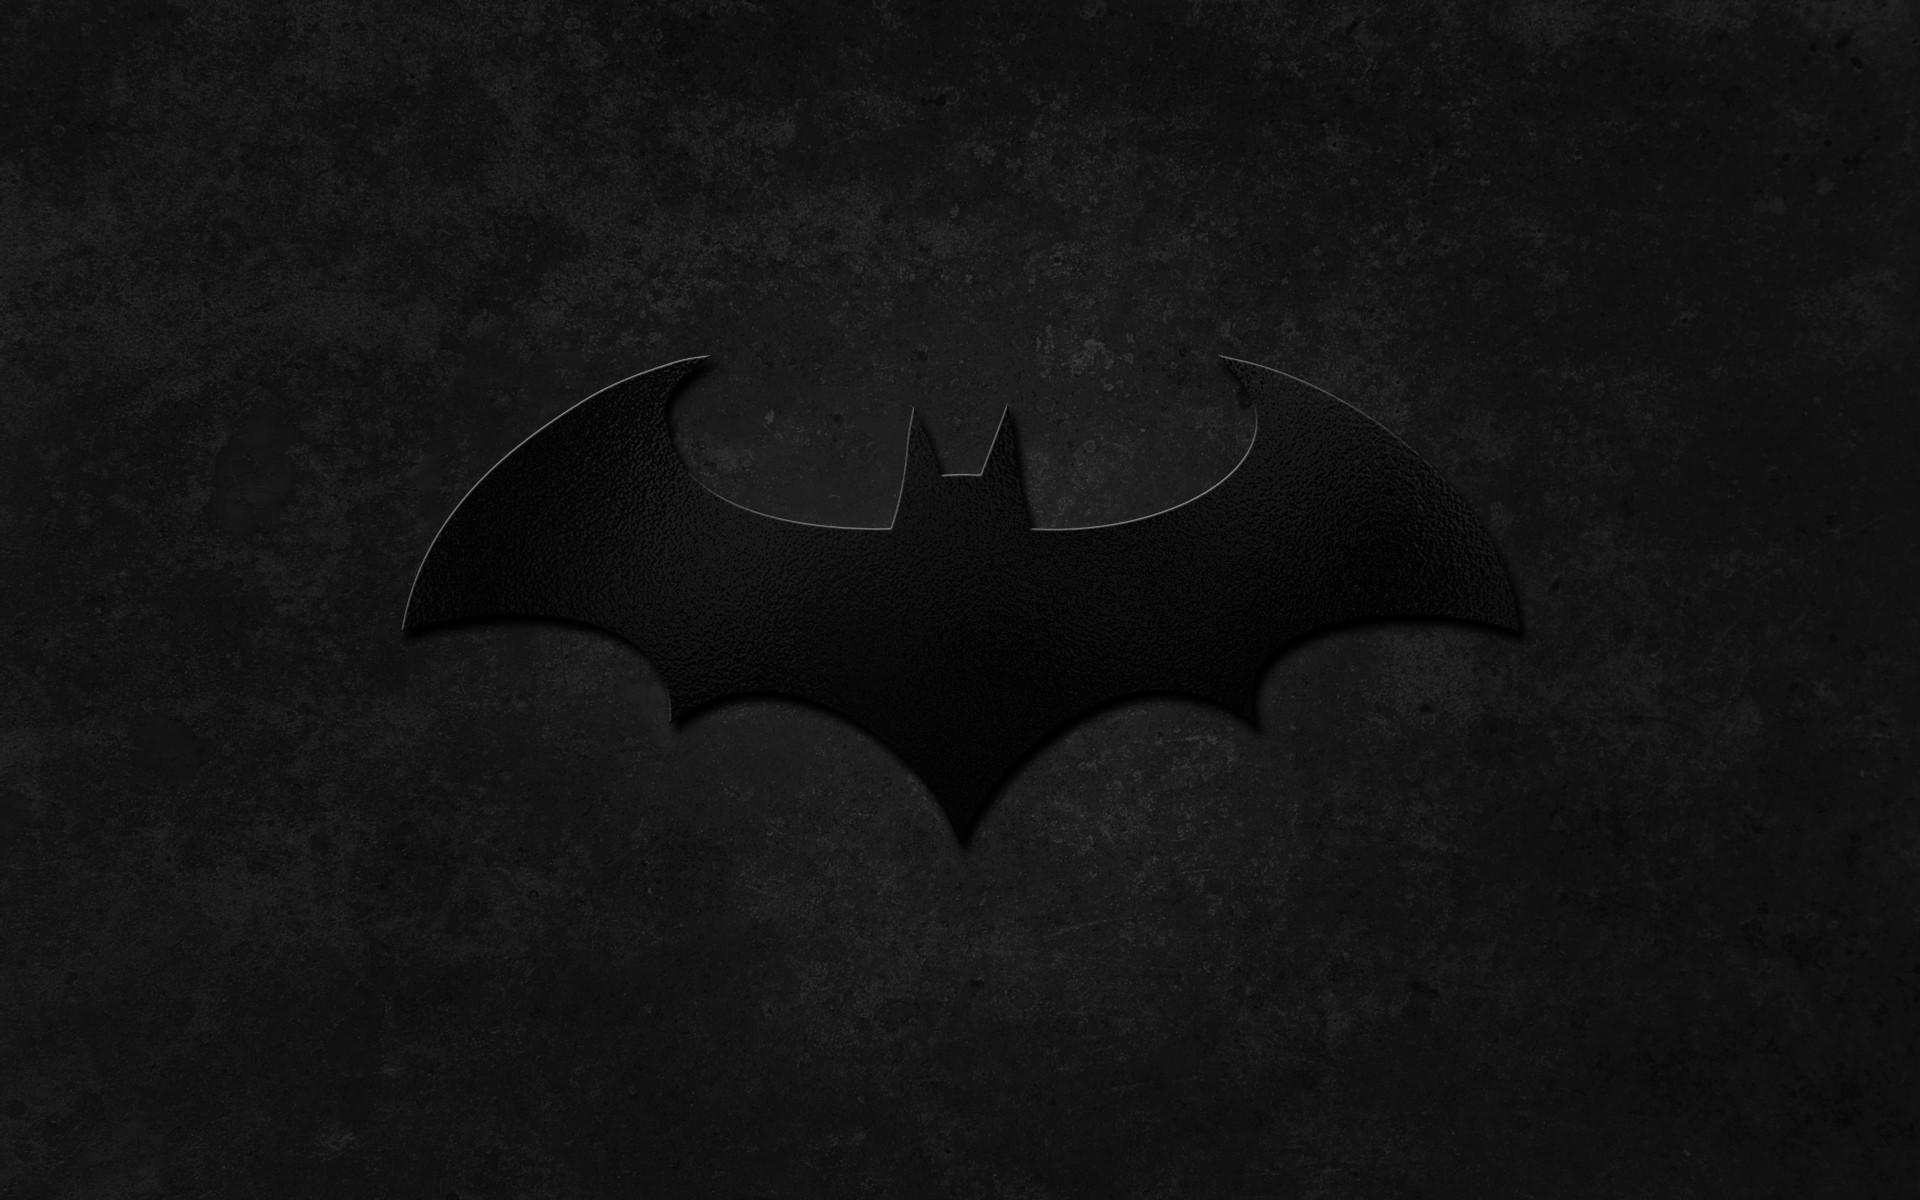 batman, wallpaper, logo, art, enterprises